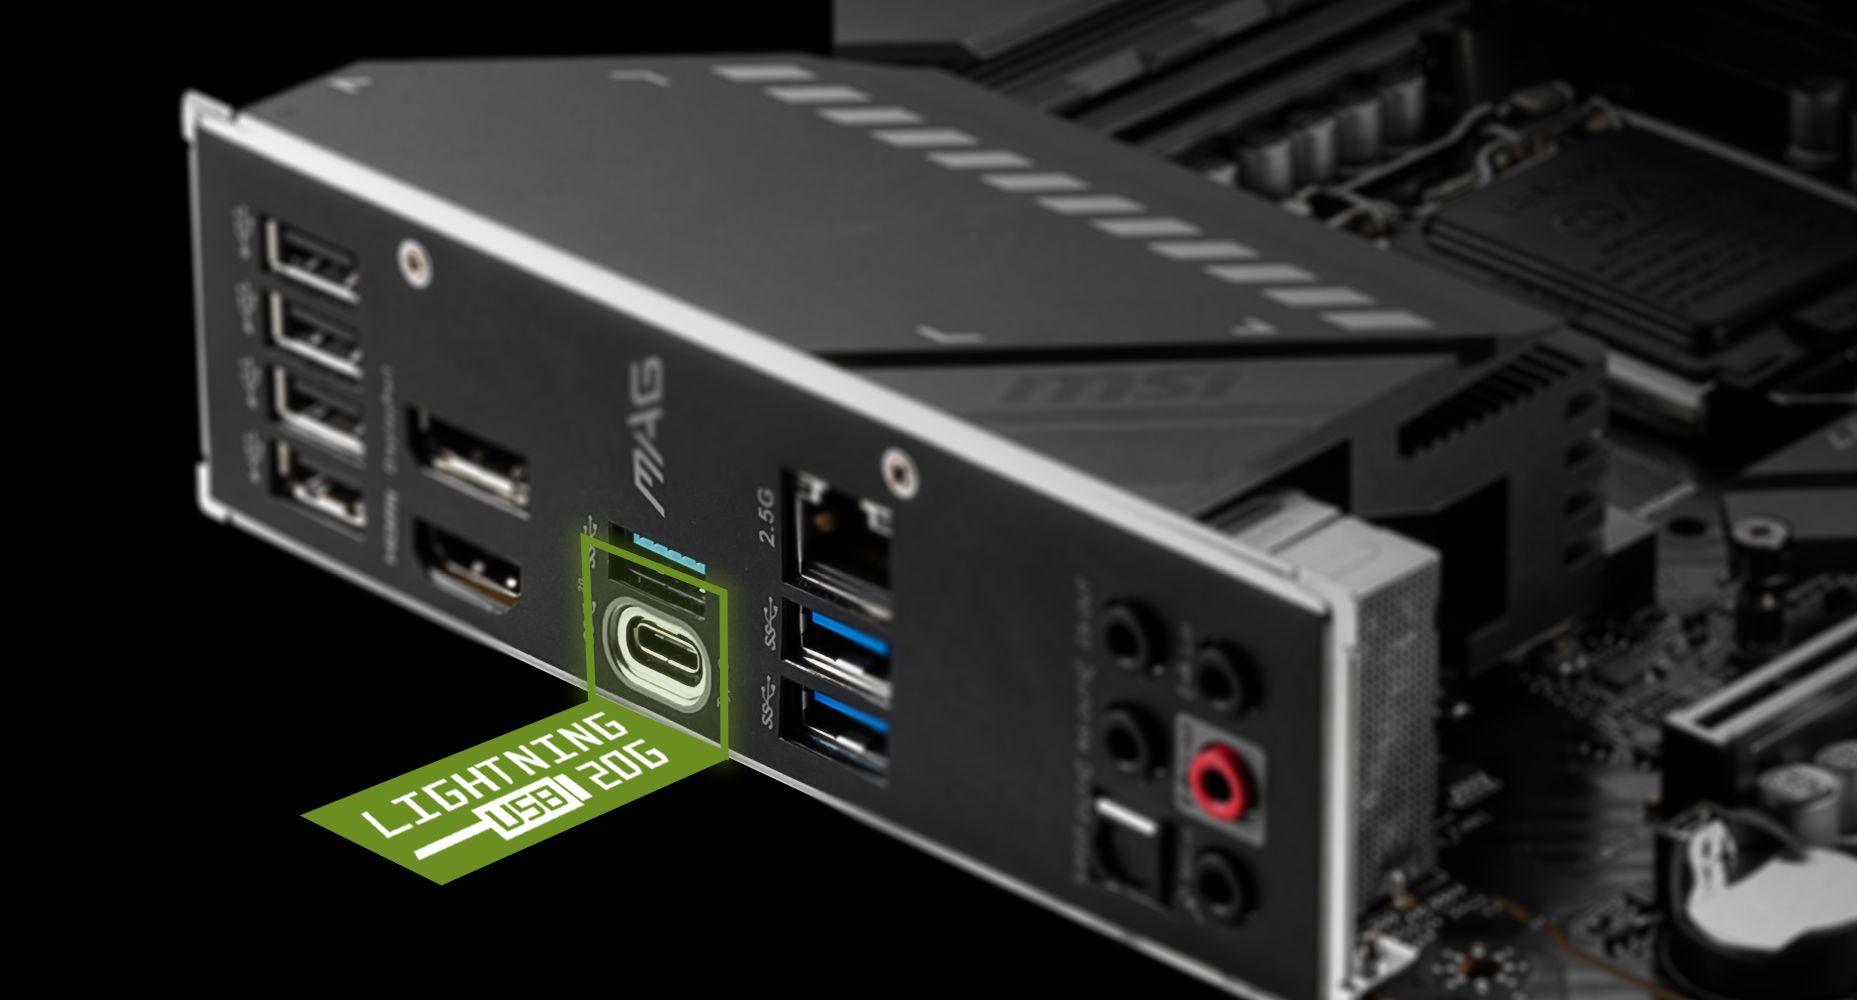 MSI DOUBLE BANDWIDTH WITH LIGHTNING USB 3.2 GEN 2x2 20G